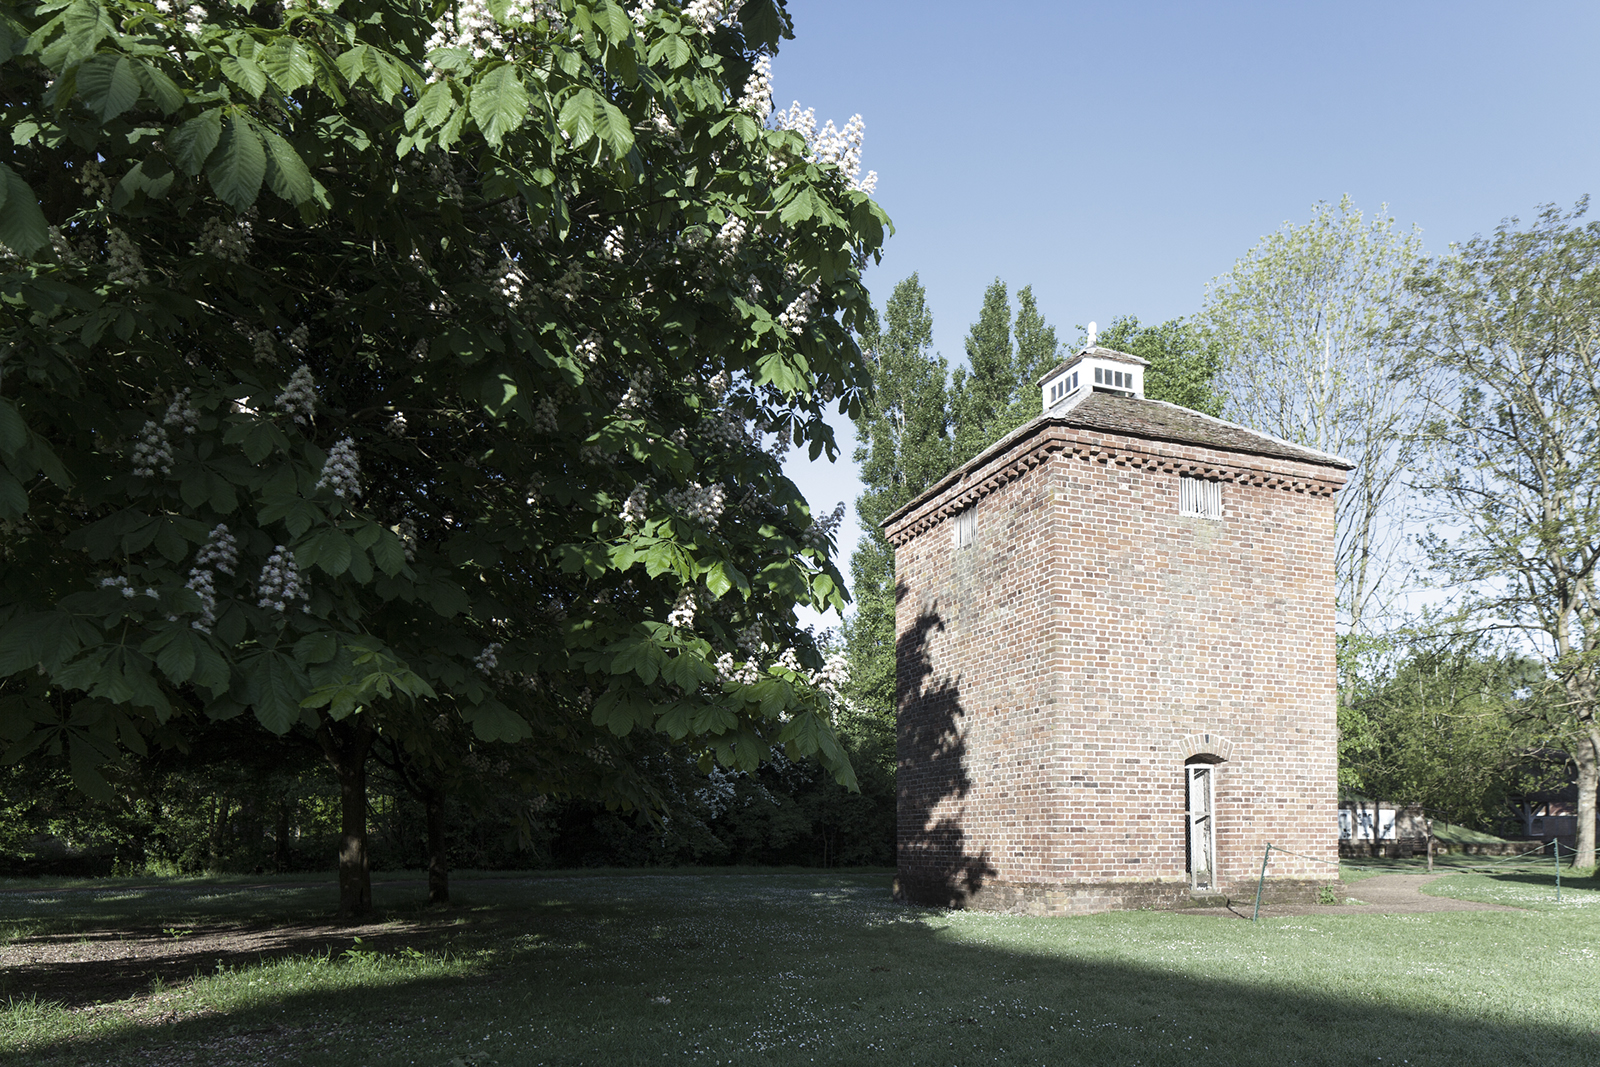 Avoncroft's historic buildings